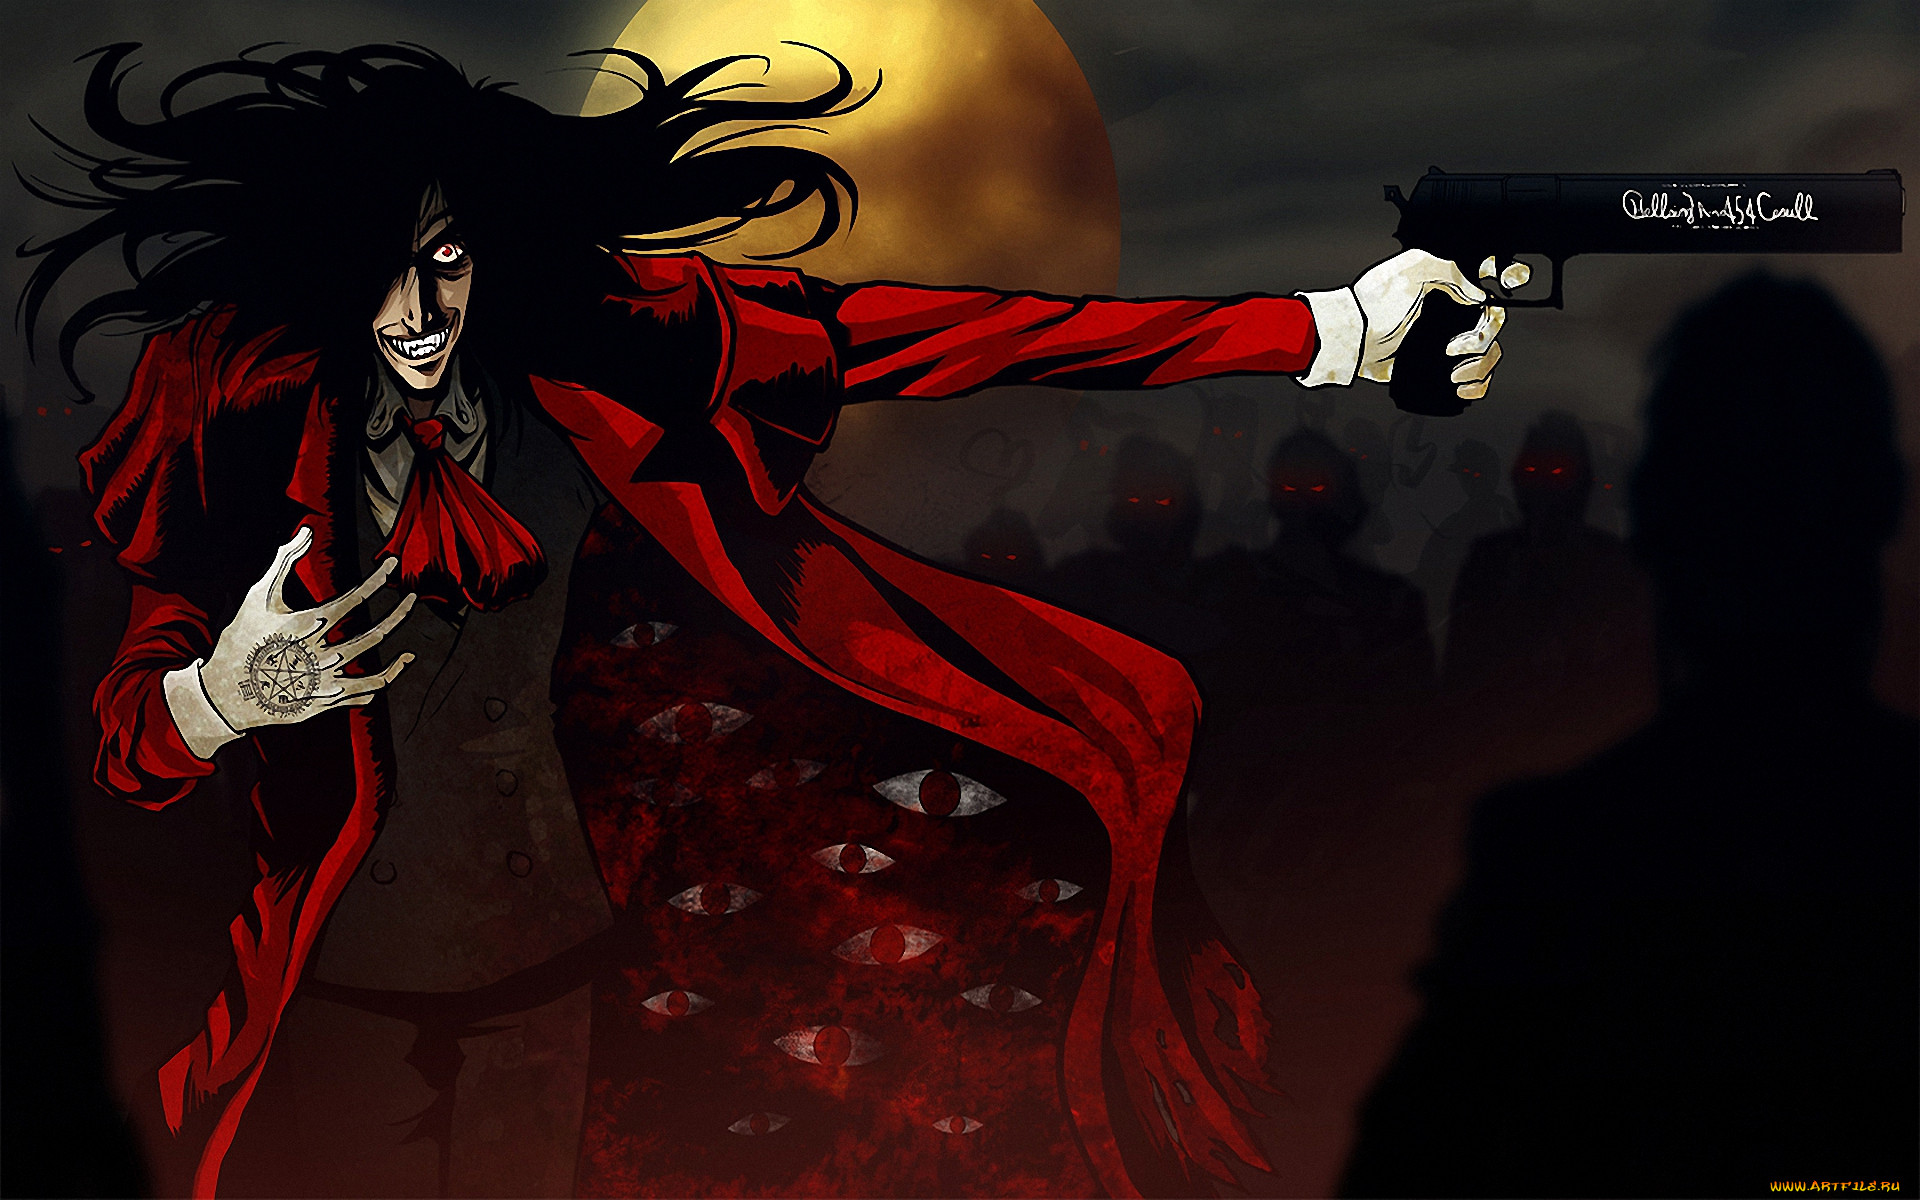 аниме, hellsing, алукард, alucard, дракула, вампир, шакал, оружие, пистолет, dracula, луна